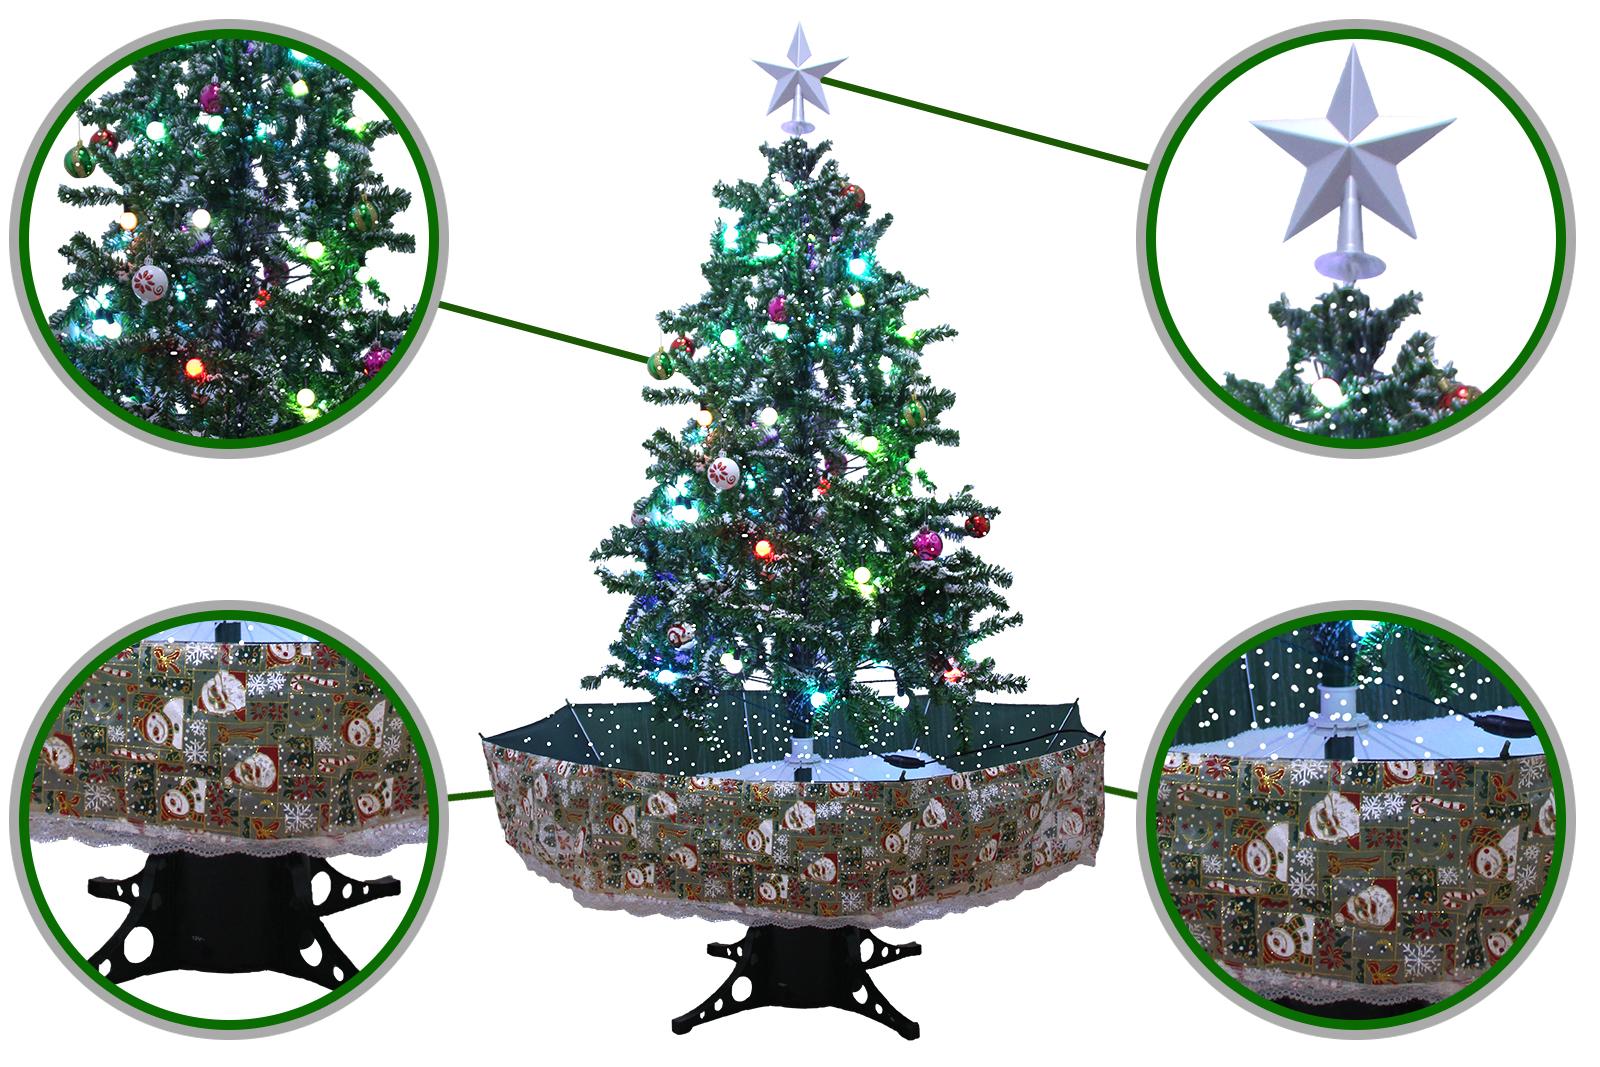 Umbrella Christmas Tree Uk.Snowing Christmas Trees Musical Cascading Falling Snow Tree Green Umbrella Base 1 7 Meter High